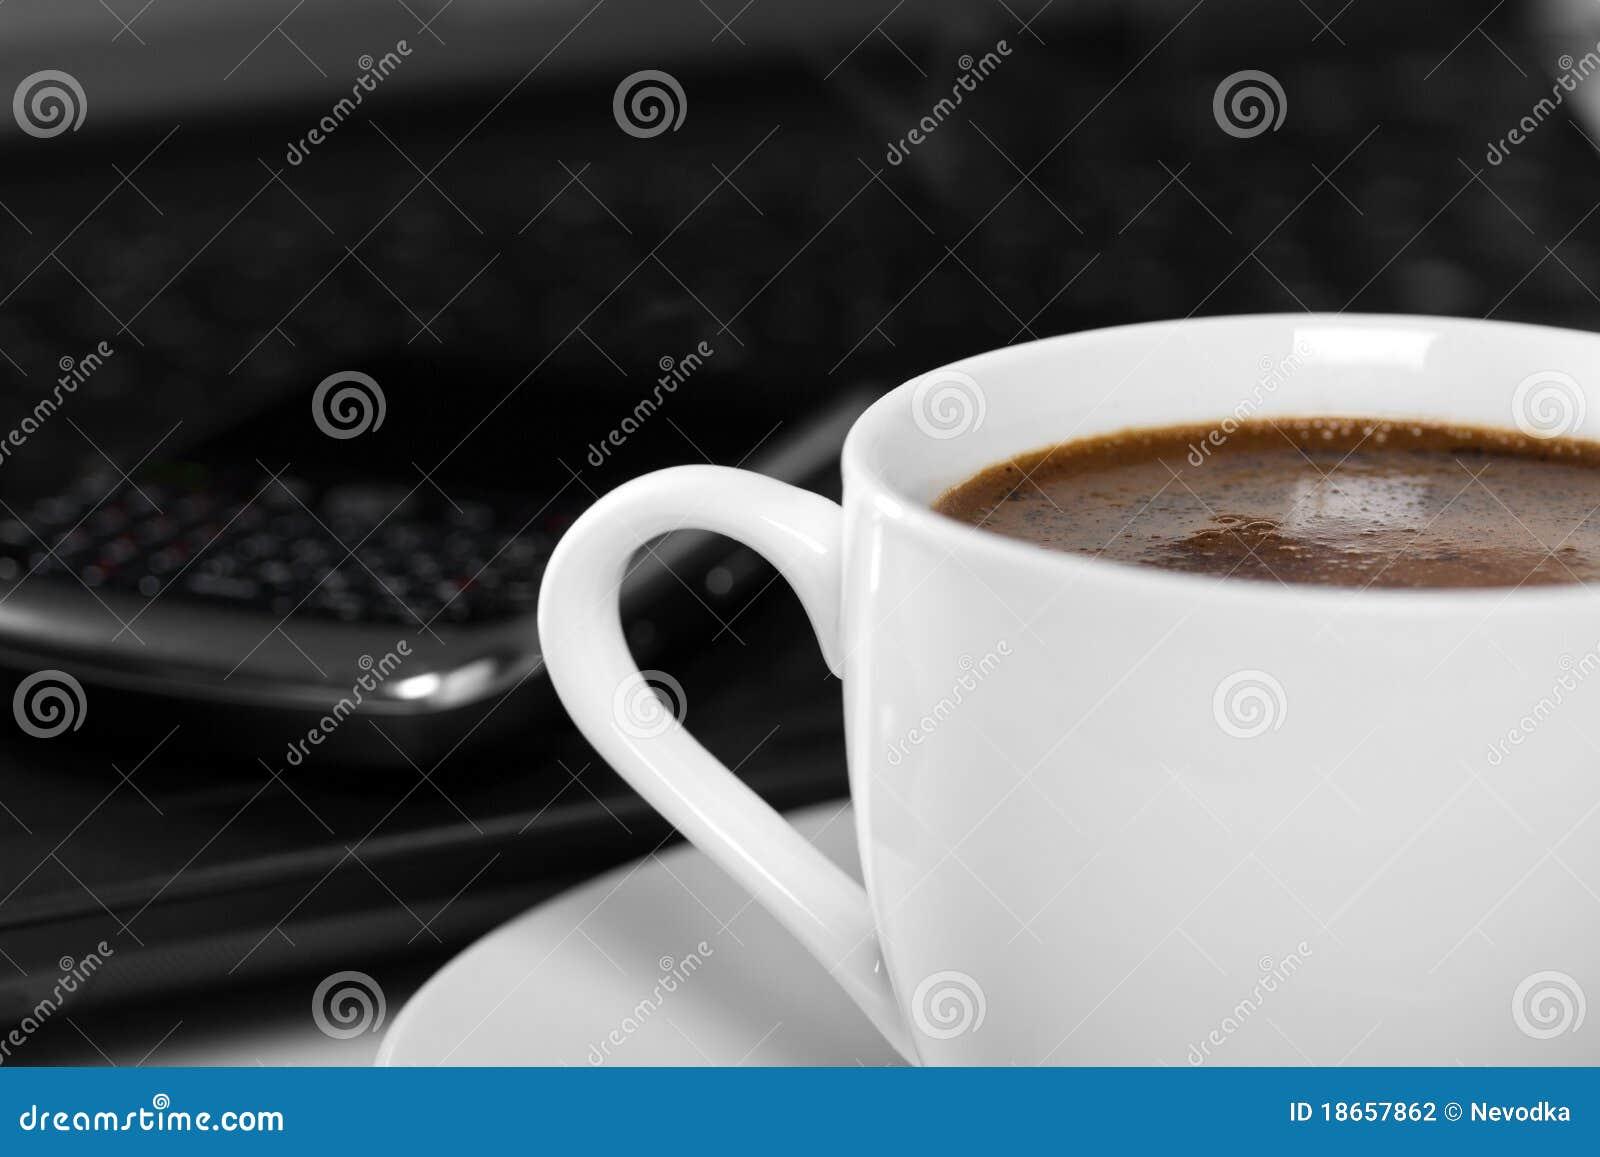 coffee break stock photography image 18657862. Black Bedroom Furniture Sets. Home Design Ideas